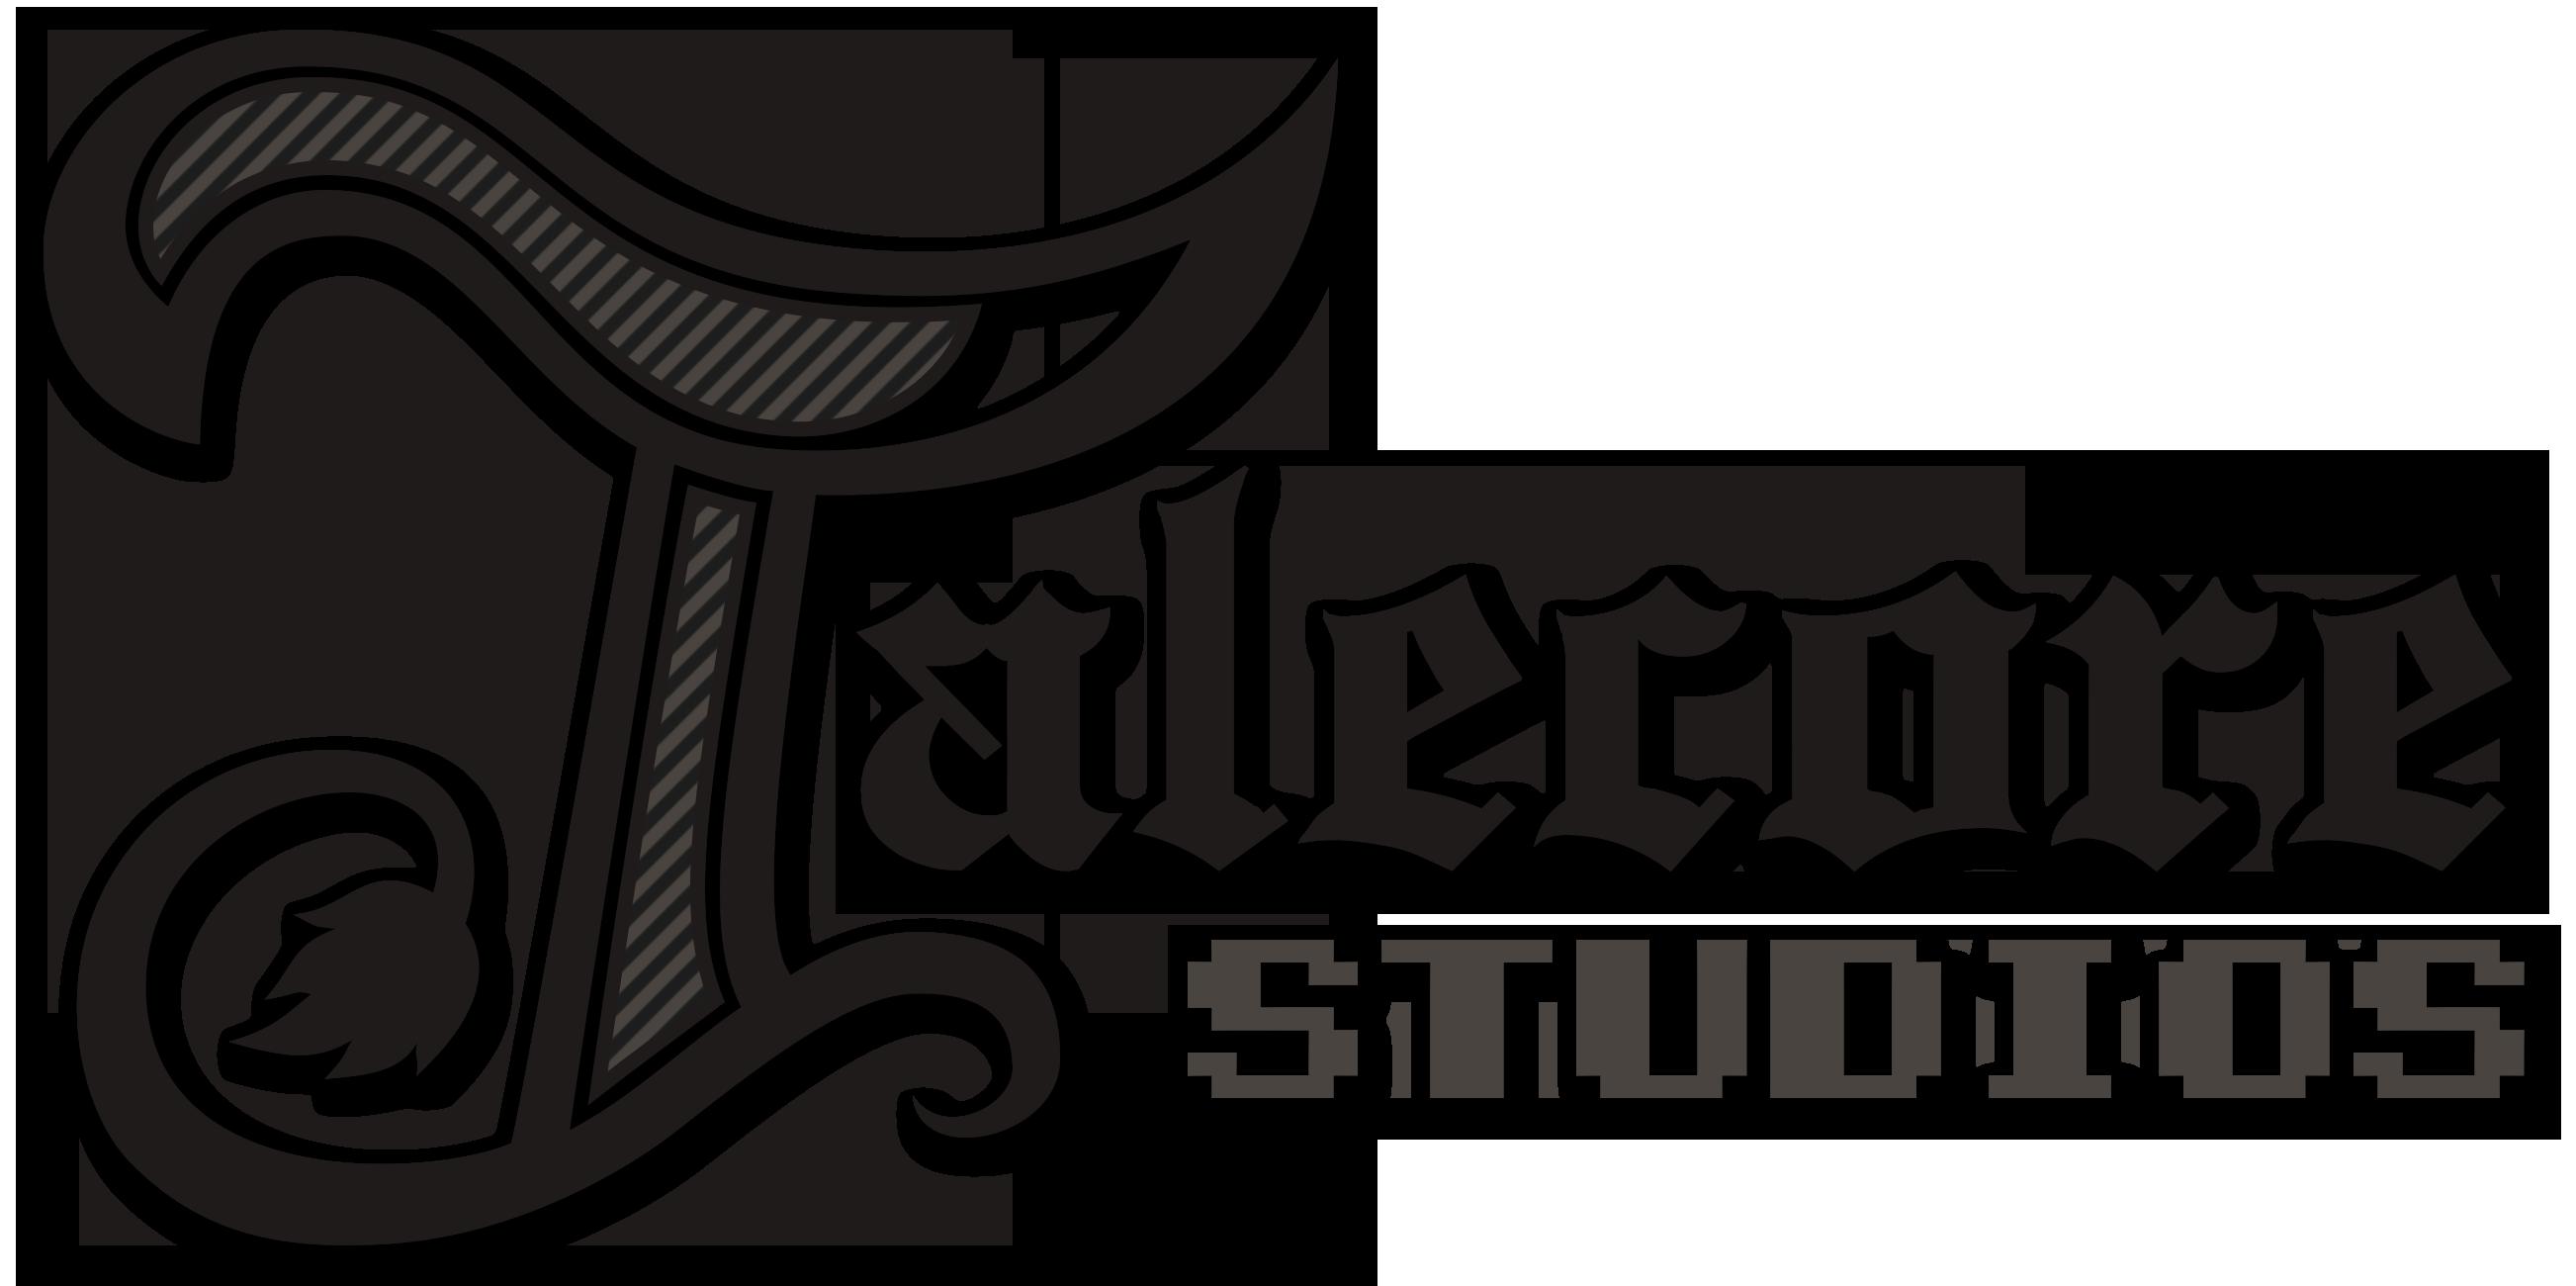 Talecore Studios